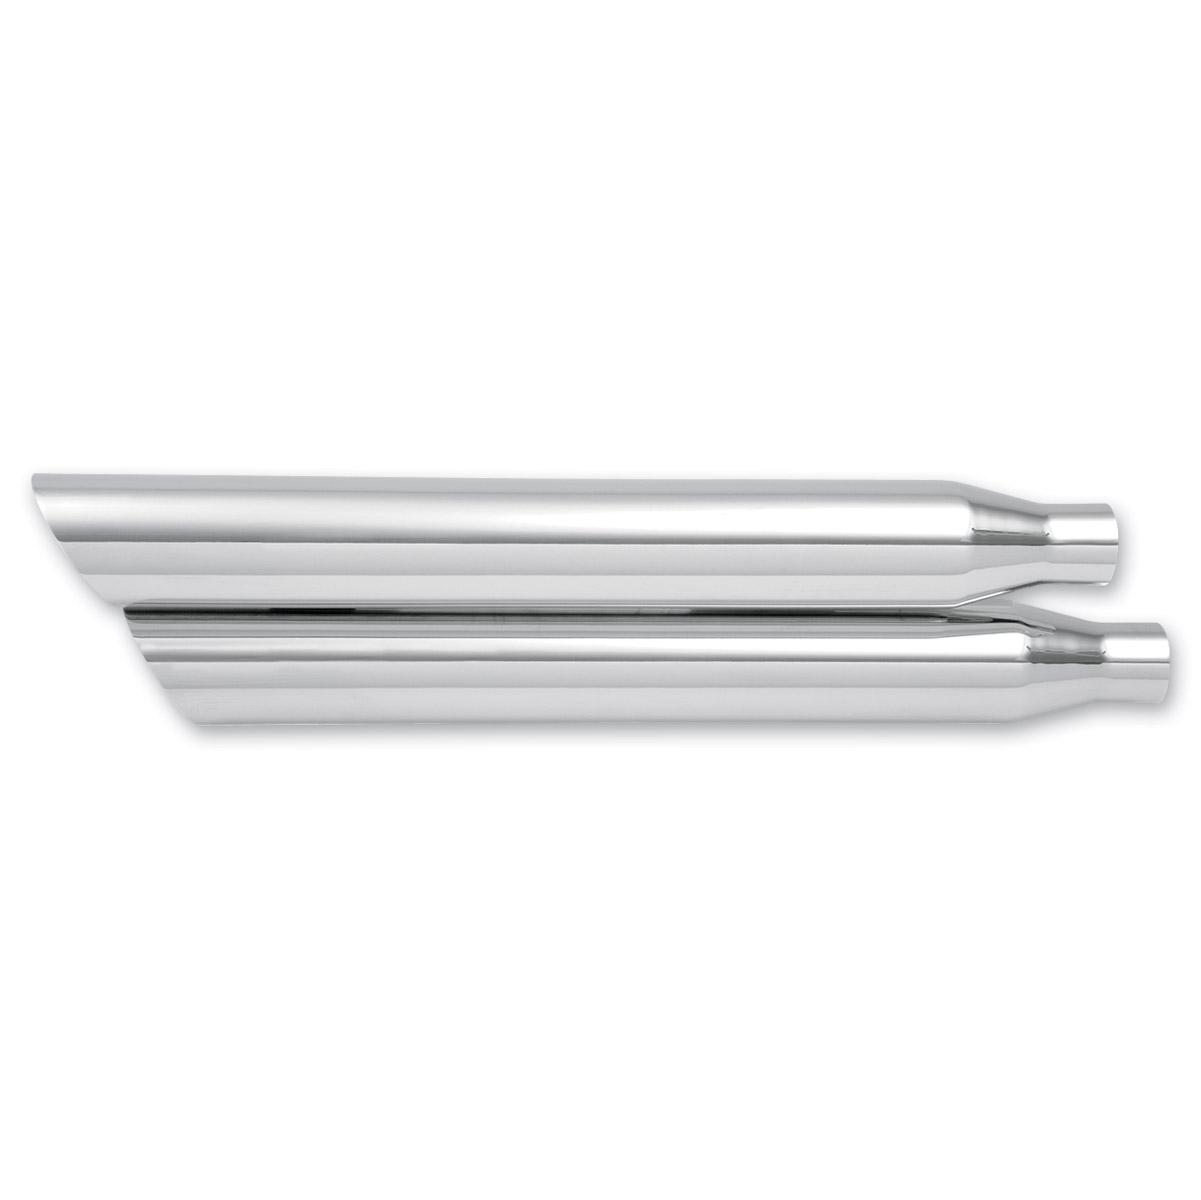 Khrome Werks HP-Plus Slash-Cut Slip-On Mufflers